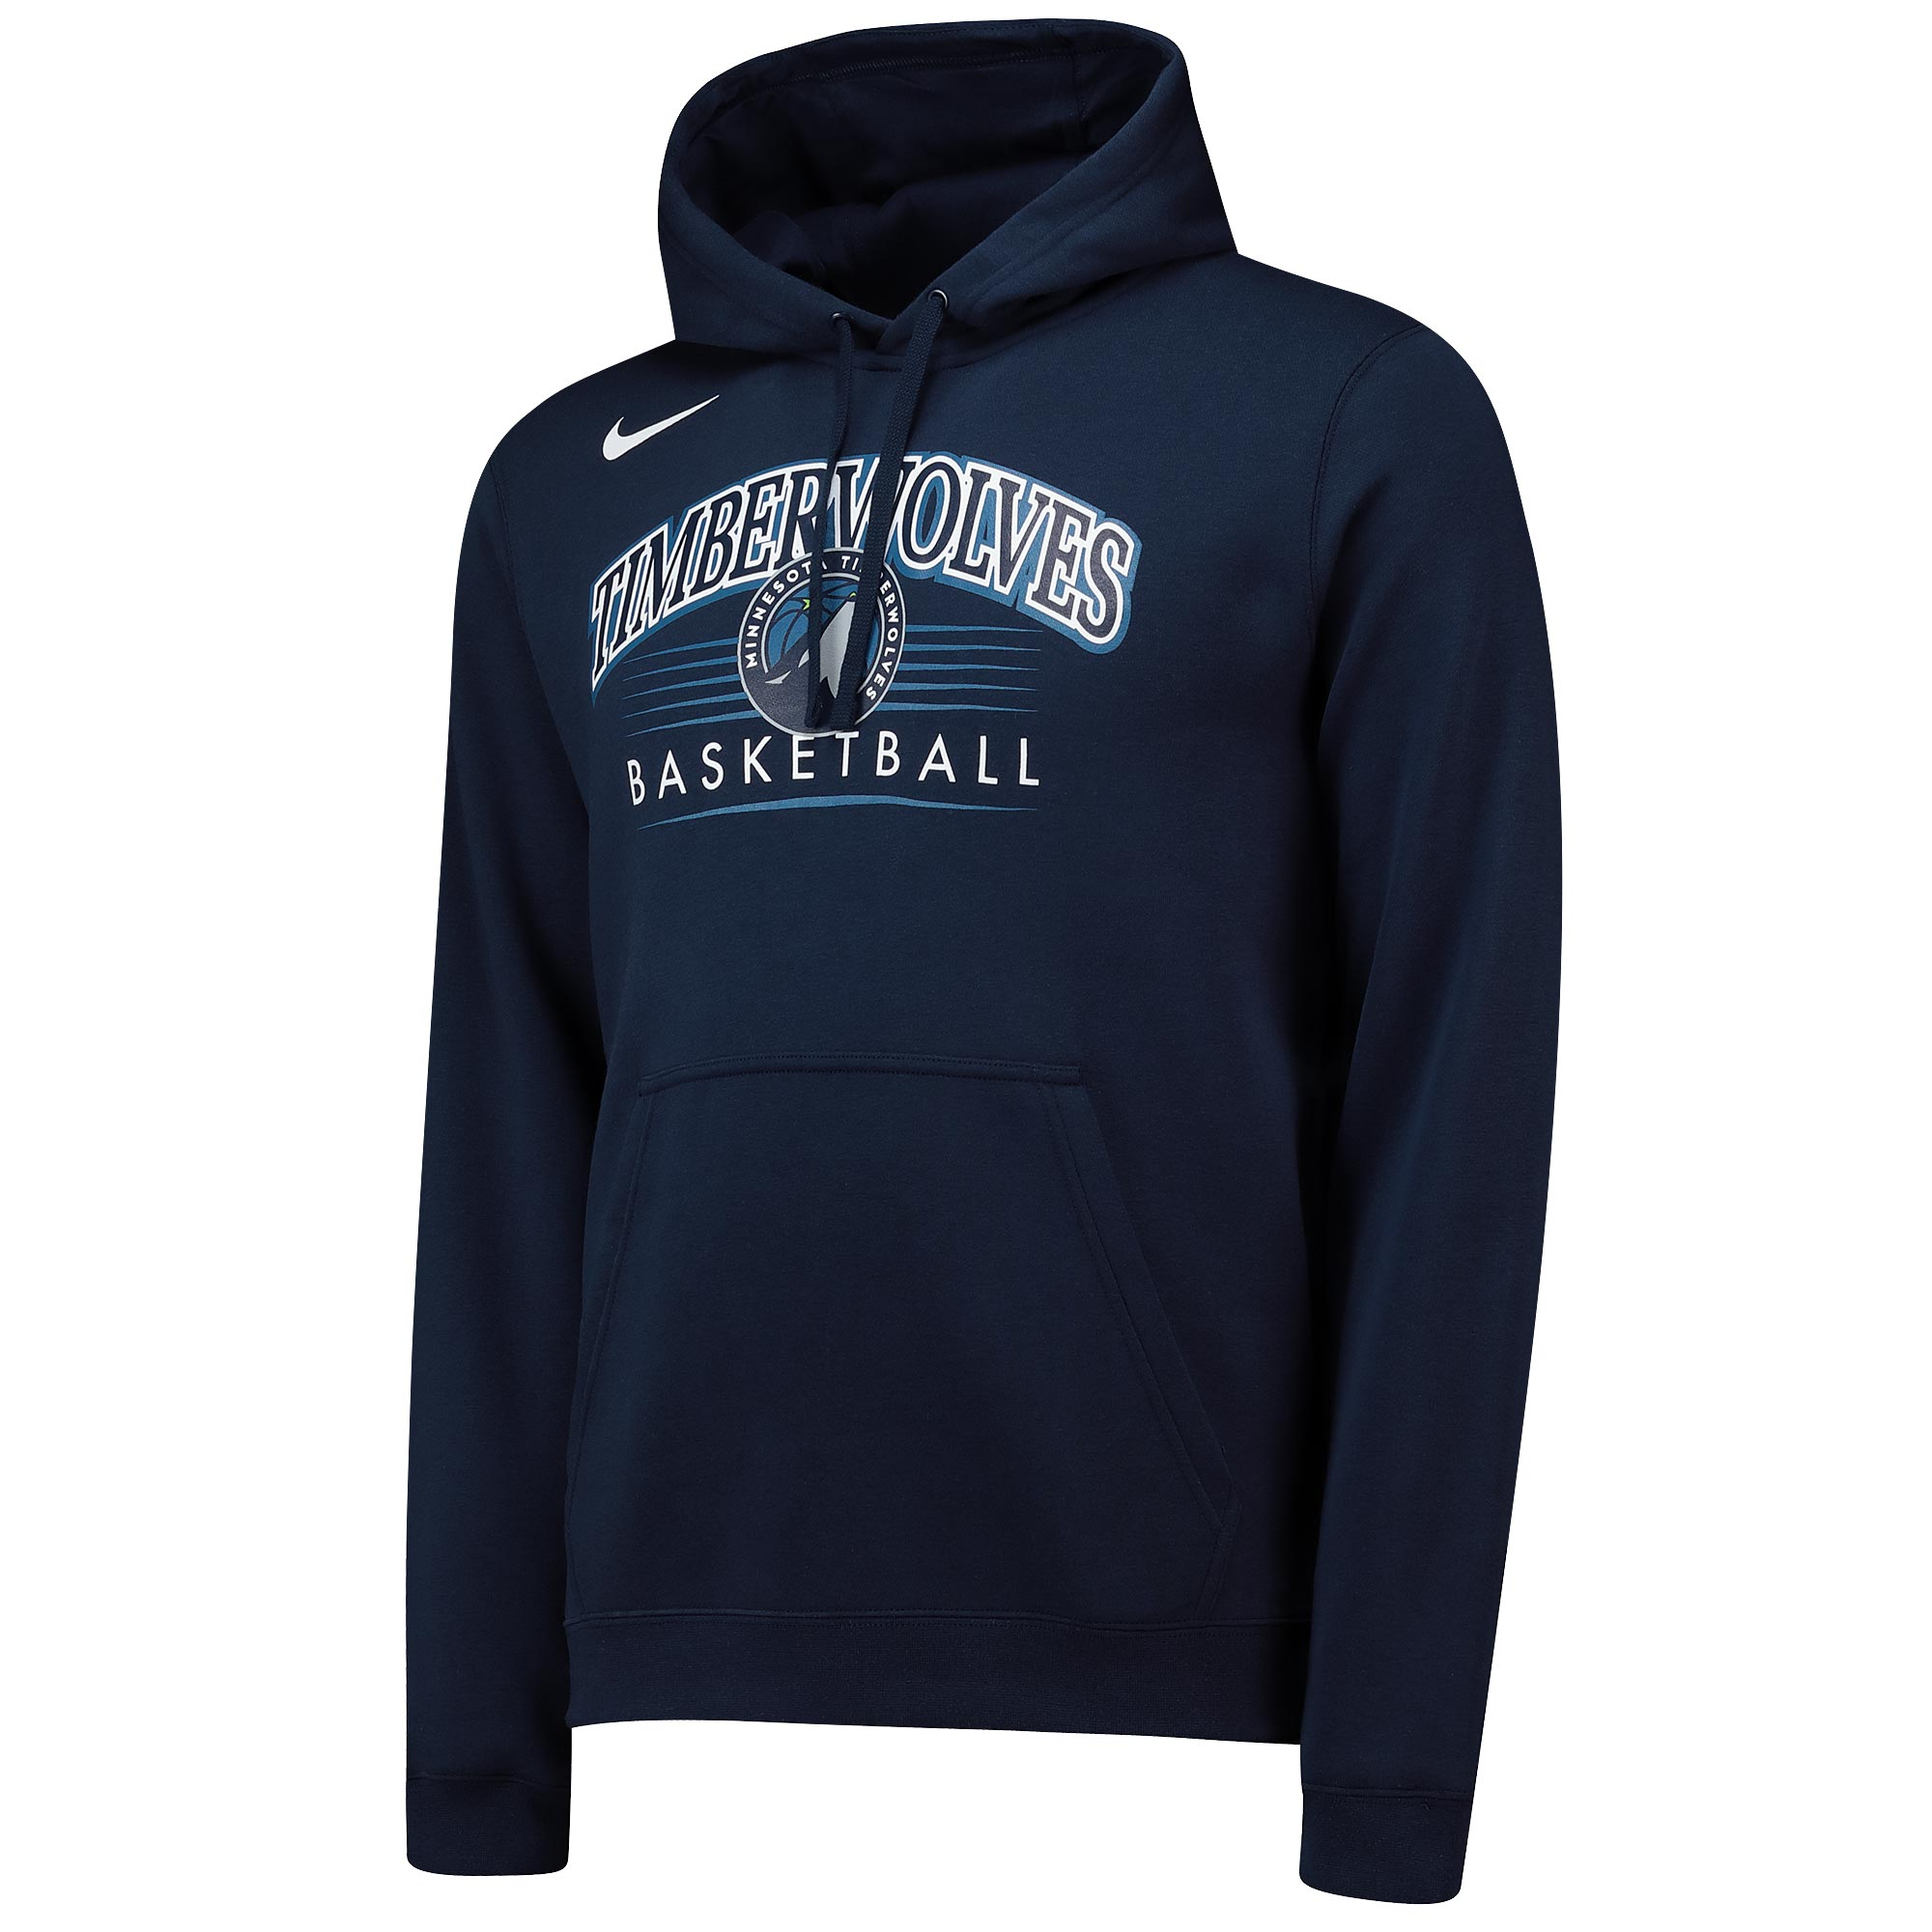 Sudadera con capucha Crest Logo de Nike de los Minnesota Timberwolves en azul marino College para hombre